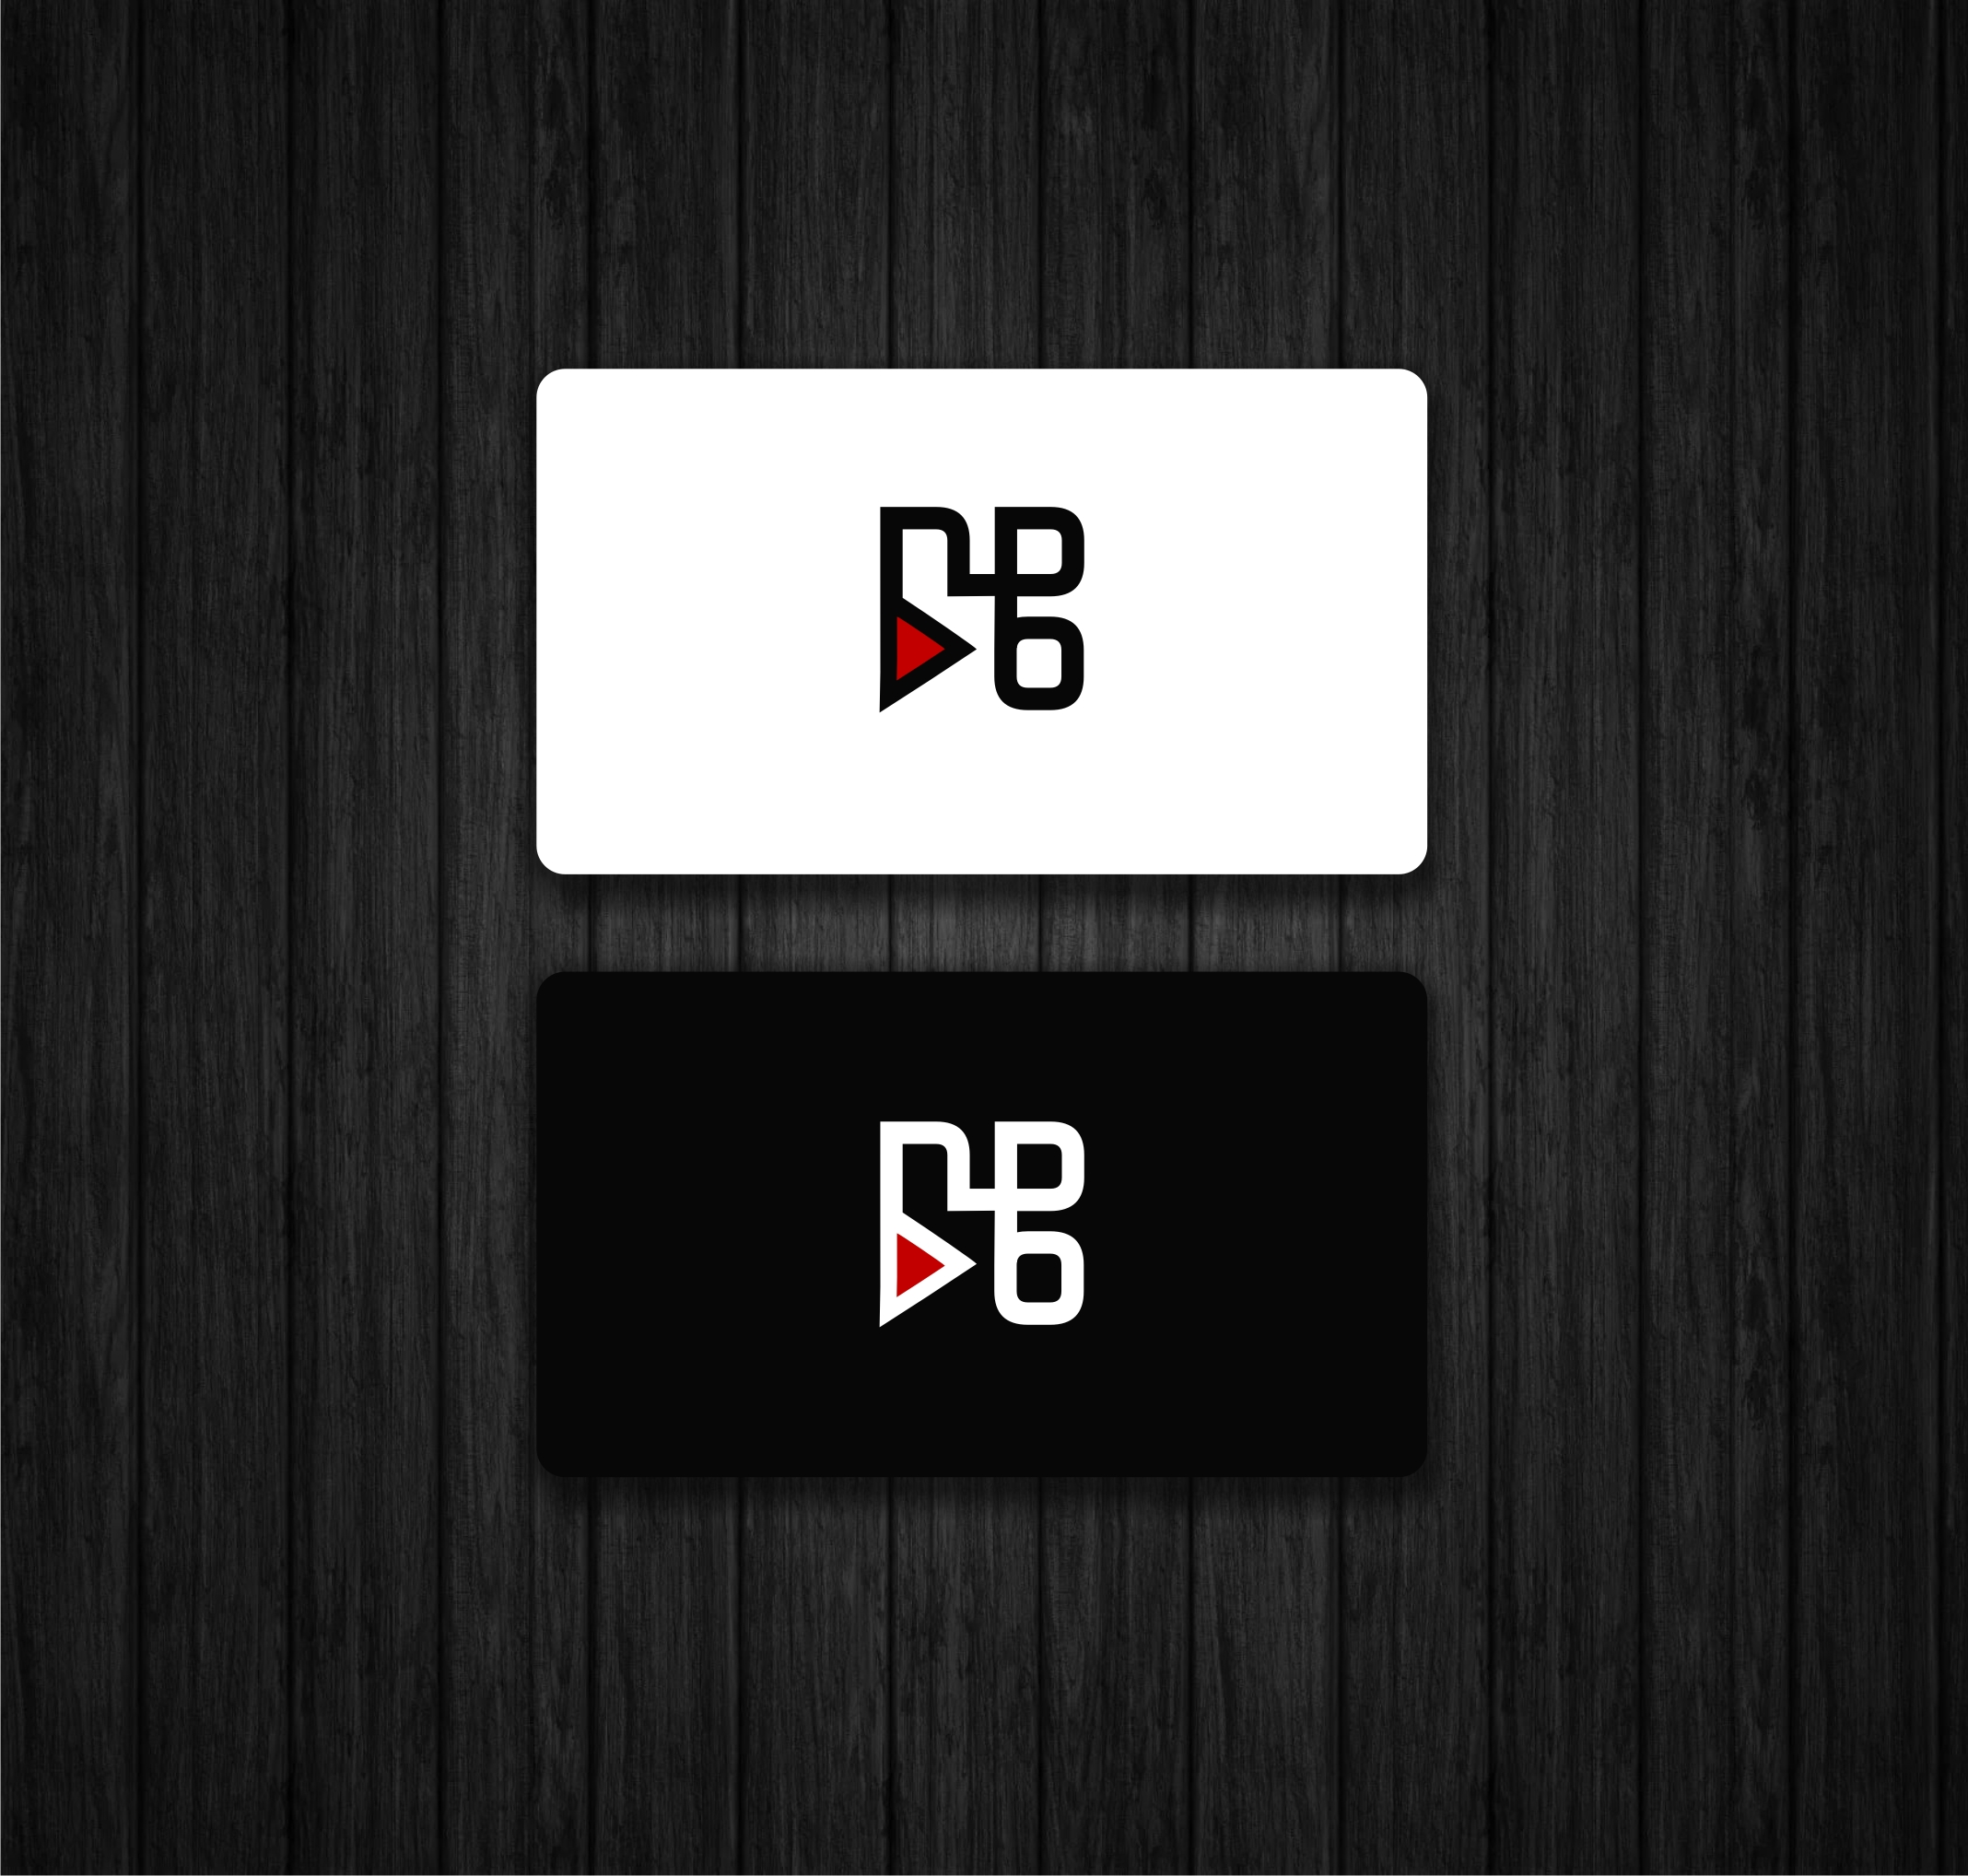 Создать логотип для YouTube канала  фото f_2045c0520fab85e7.jpg